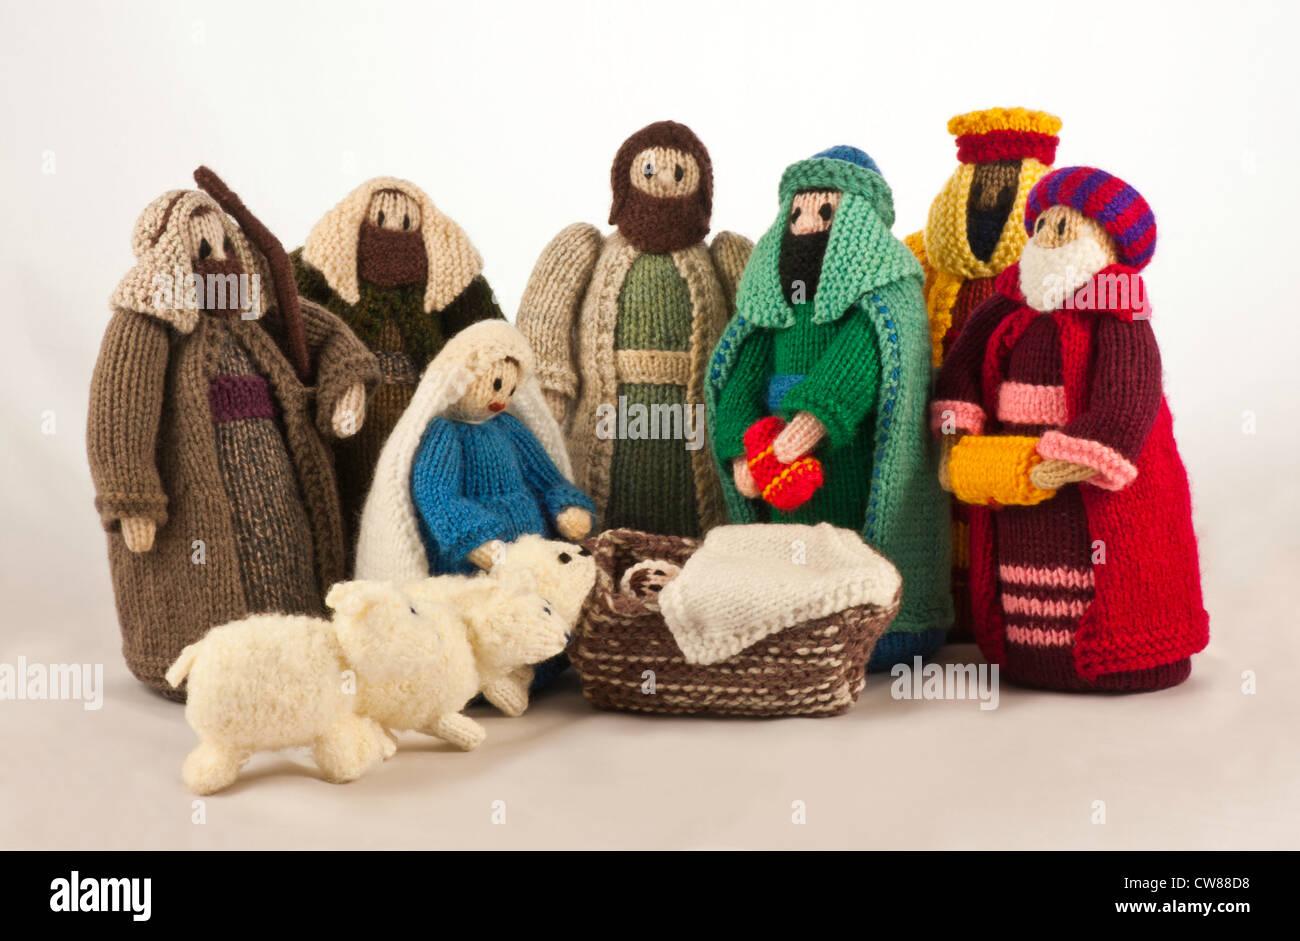 Knitted Nativity Scene With Mary, Joseph, Baby Jesus, Two Shepherds Stock Pho...